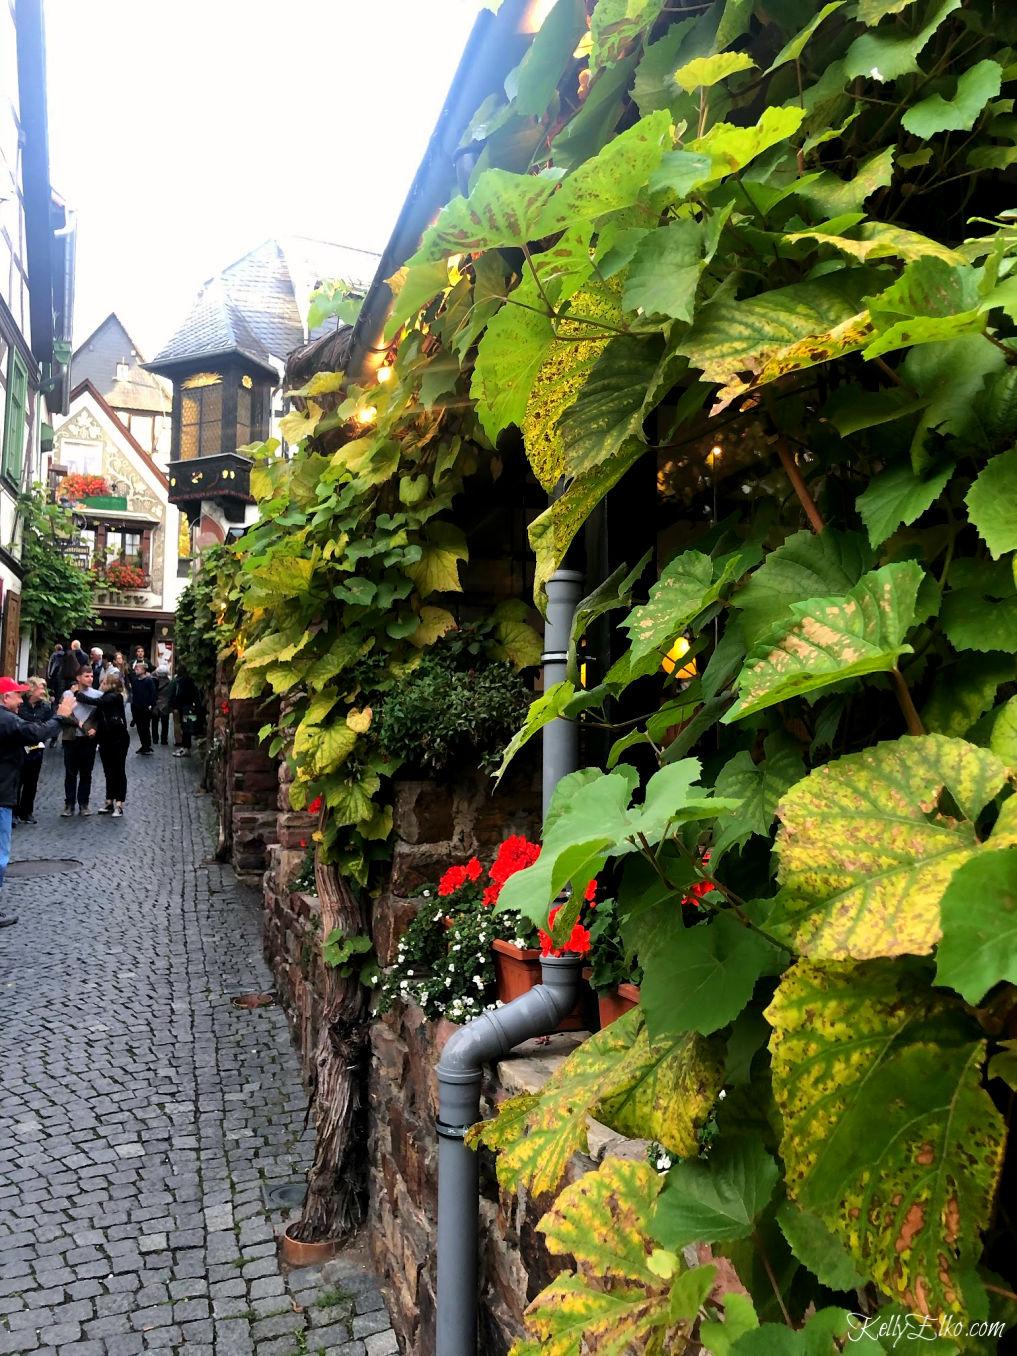 The charming Rhine river village of Rudesheim Germany has beautiful vine covered buildings kellyelko.com #Rudesheim #germany #rivercruise #rhineriver #travel #travelblog #travelblogger #vacation #europe #europevacation